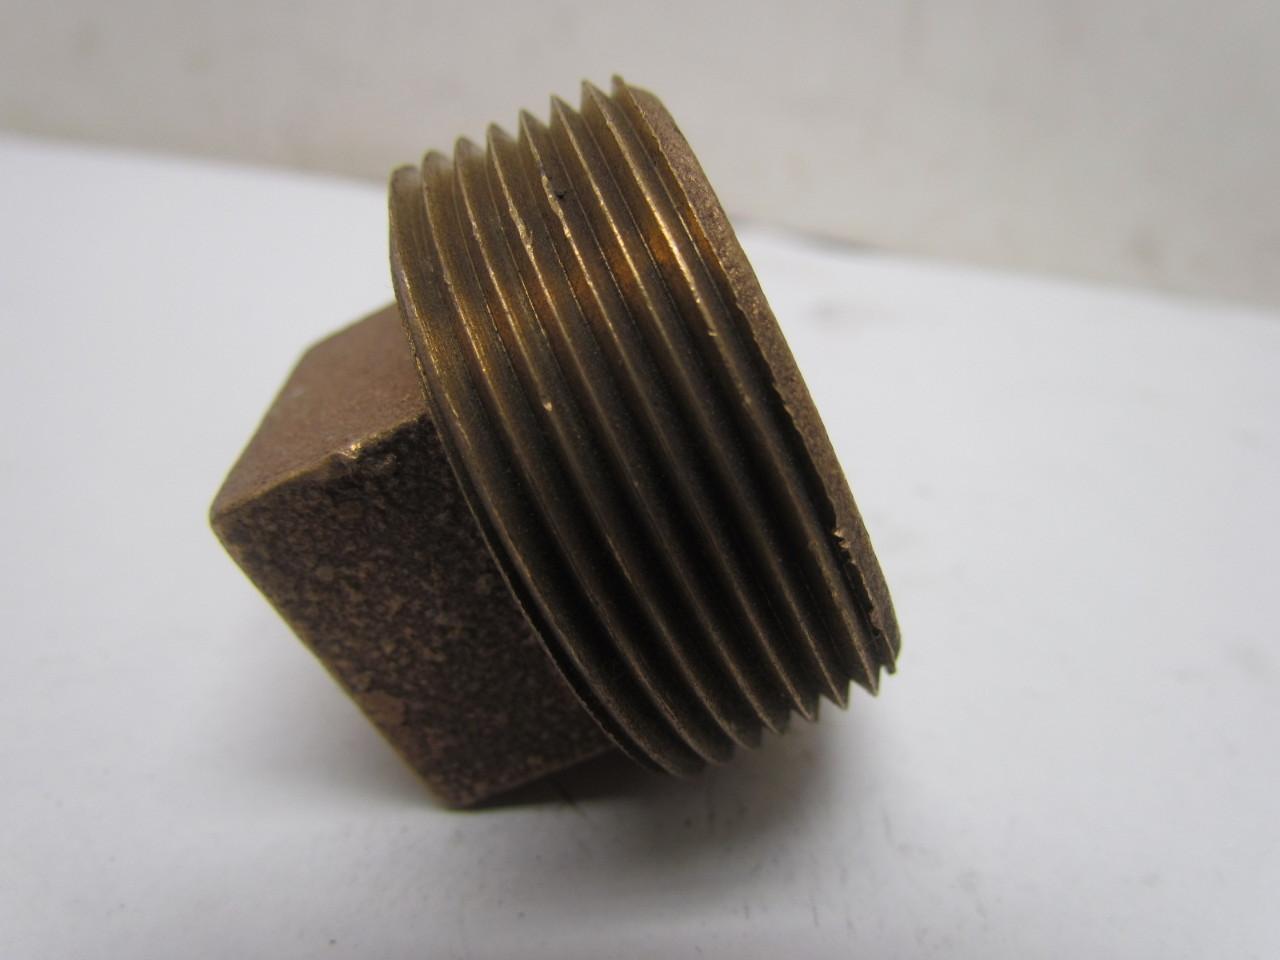 Class square head cast brass pipe plug fitting